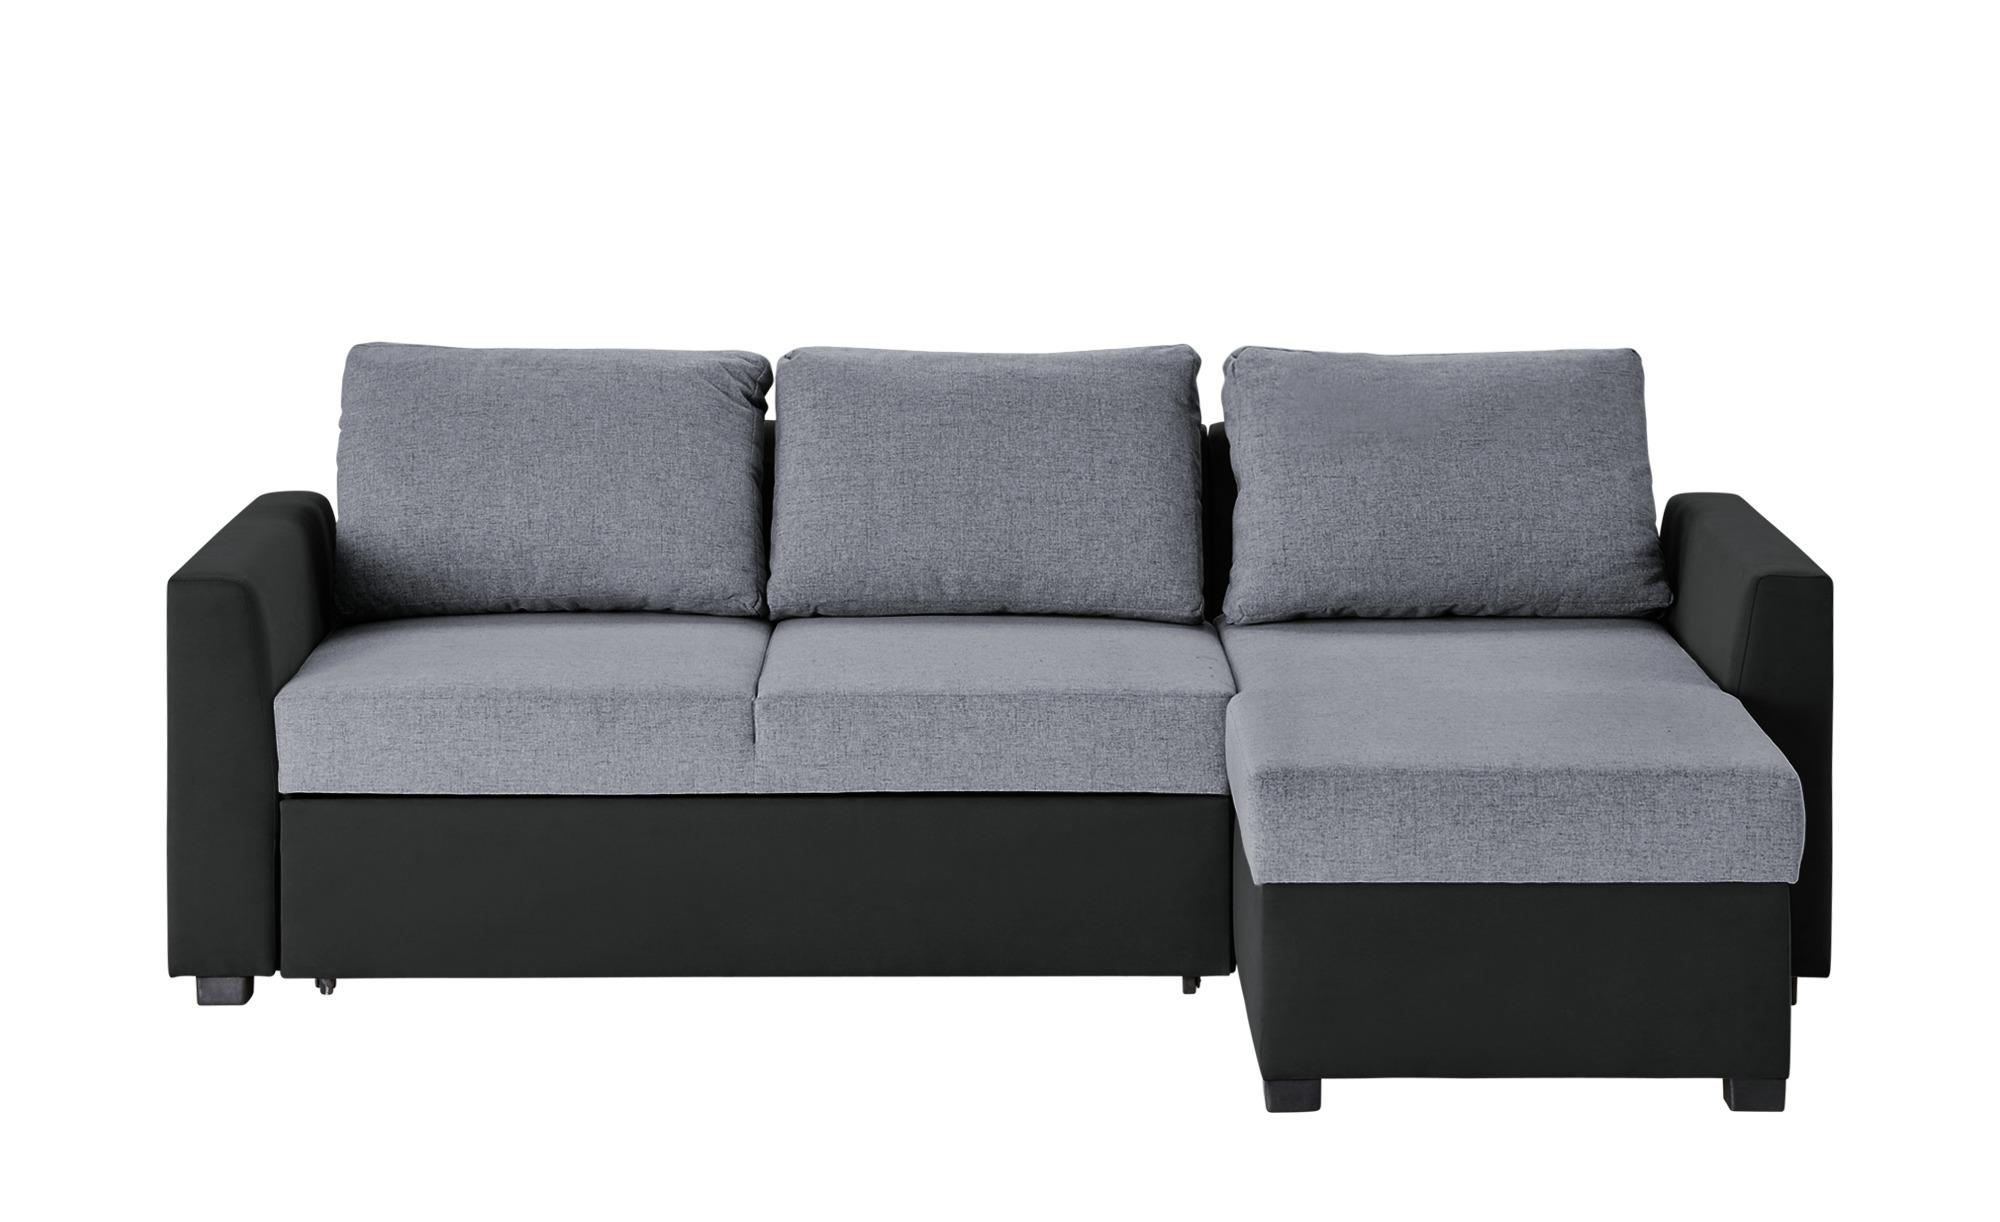 2 Sitzer Sofa Mit Recamiere Sofa Gunstig Kaufen Online Leder Sofas Gunstig Best Online Furniture Store In D Sofa Gunstig Kaufen Gunstige Sofas Sofa Leder